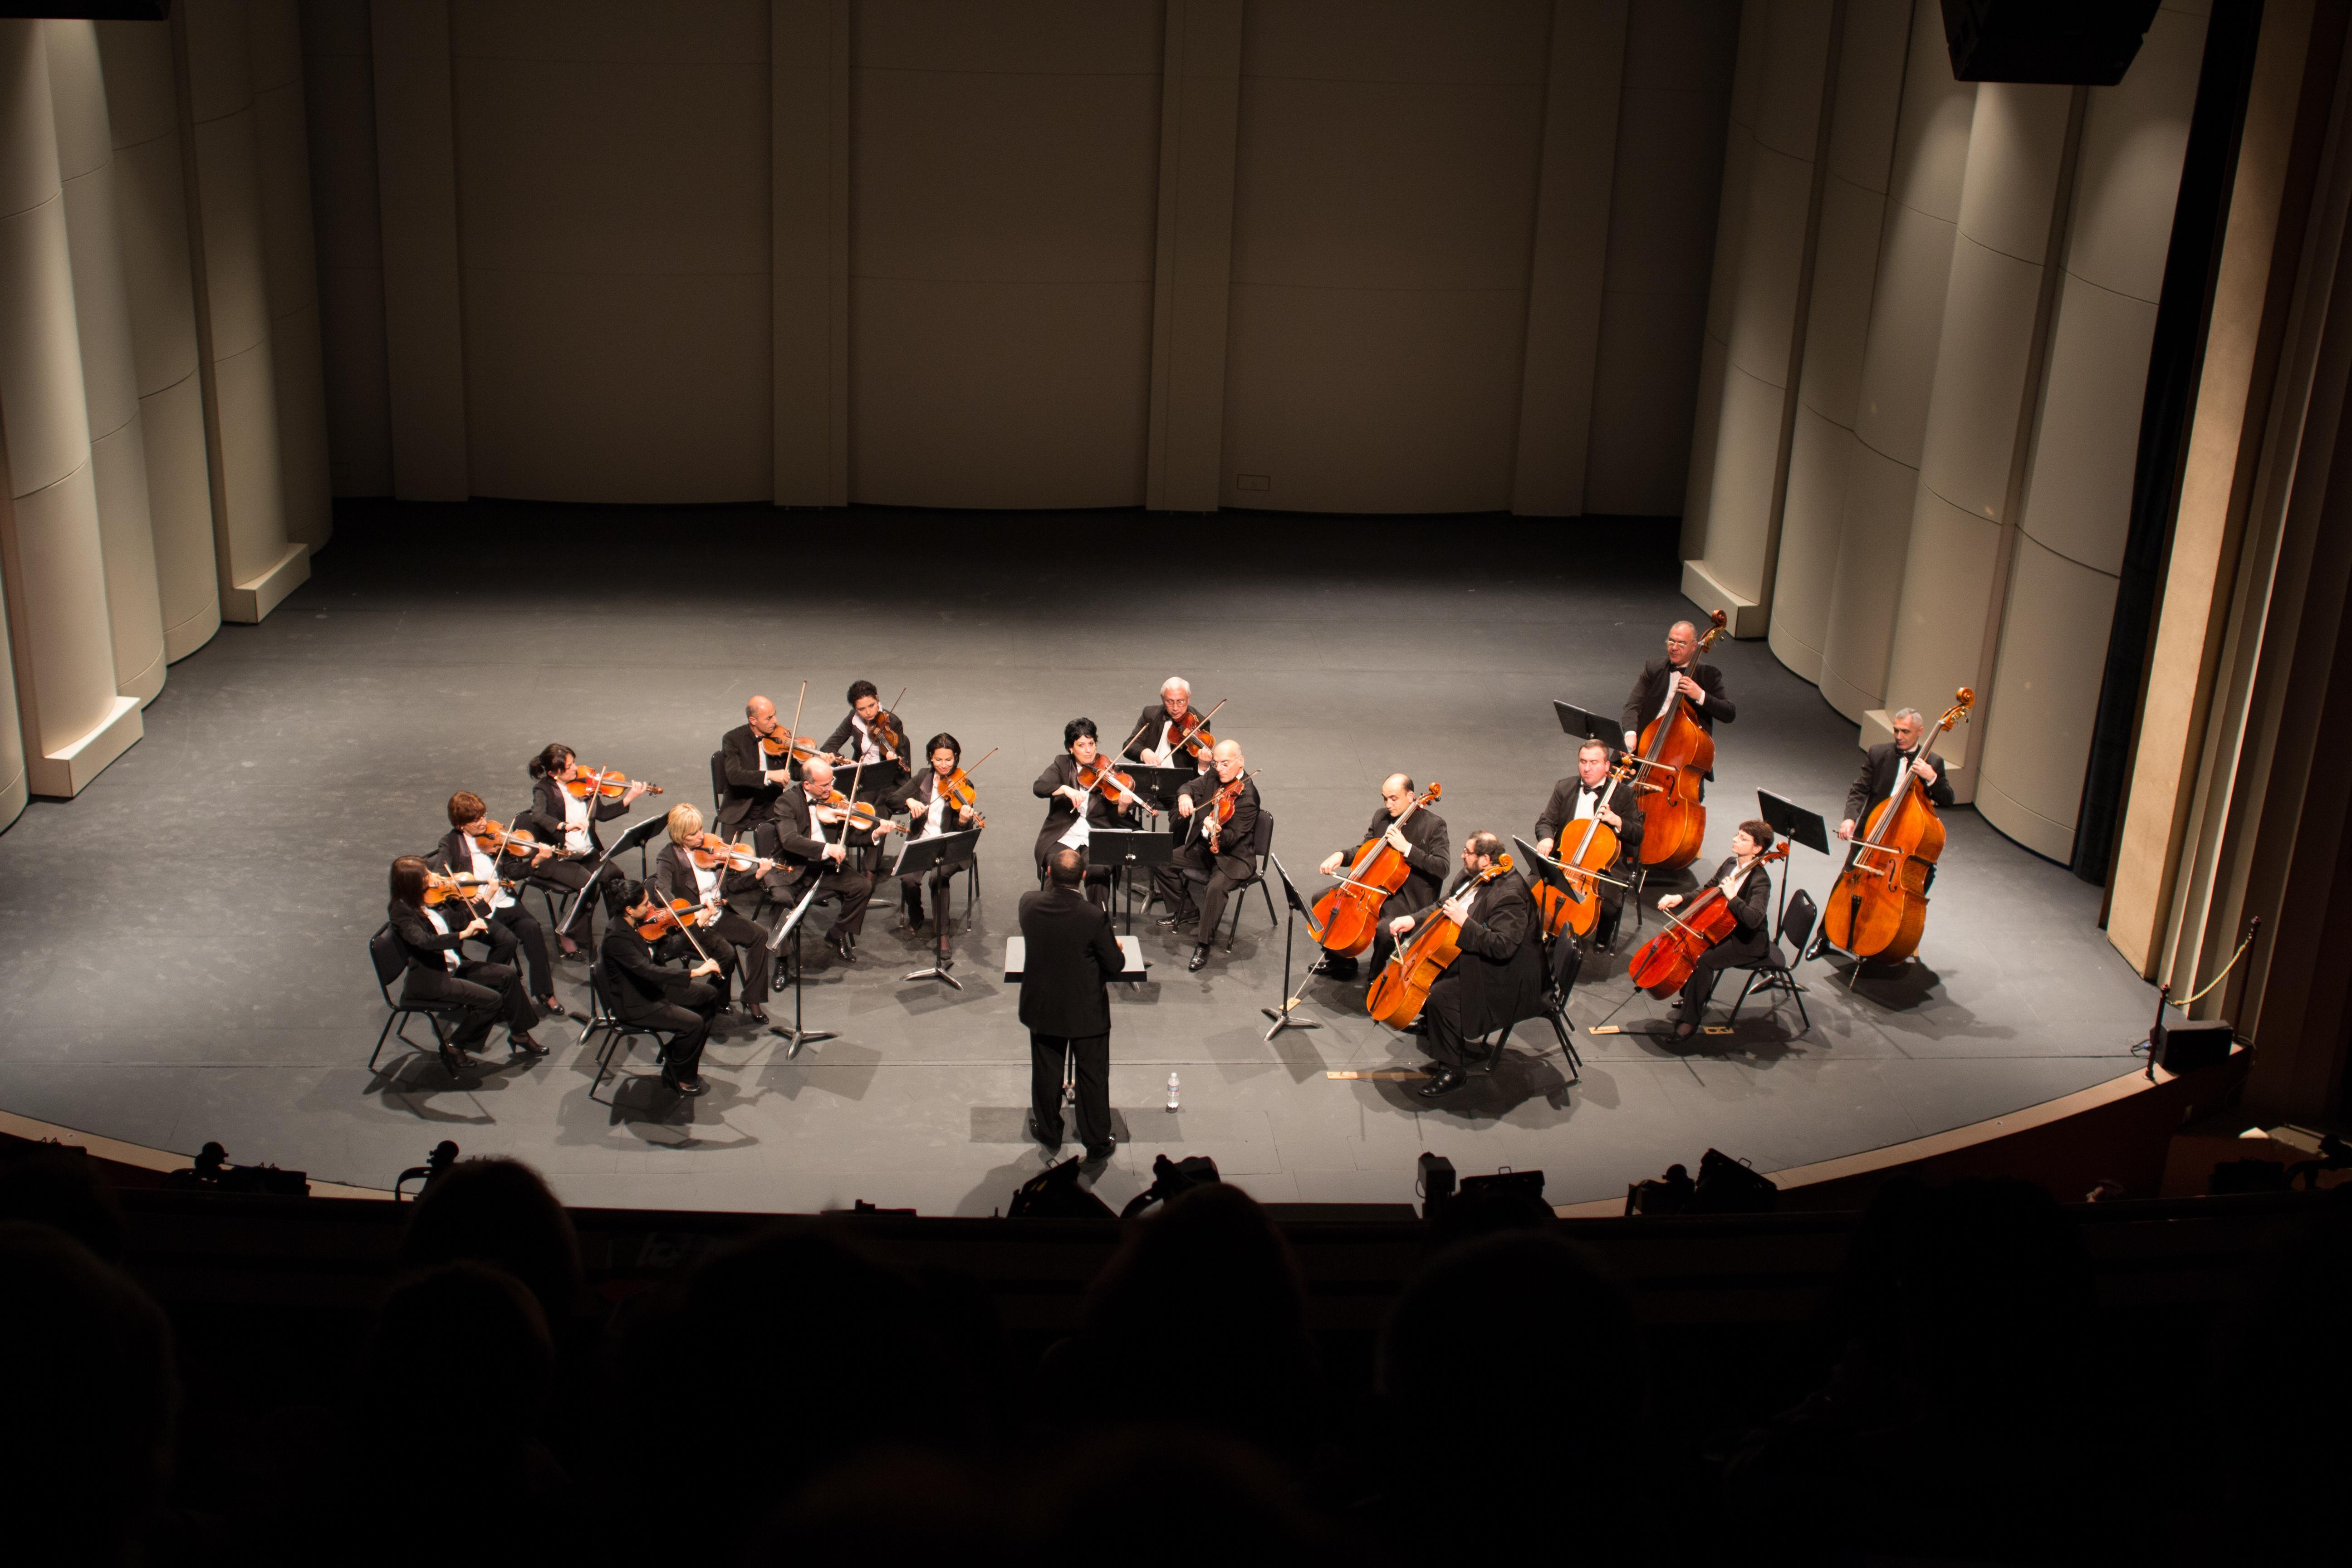 можете картинки камерного оркестра значок